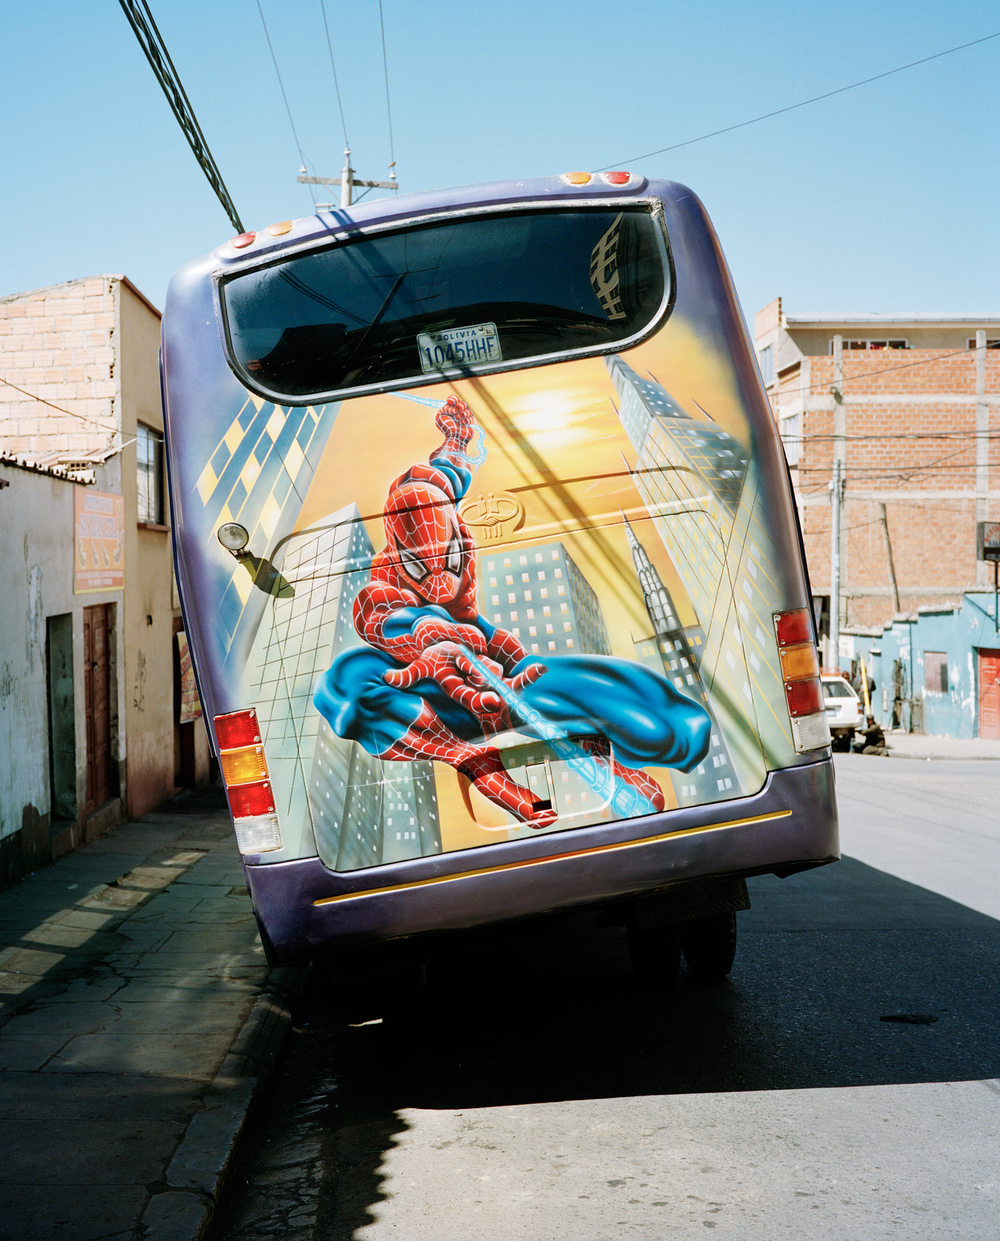 Daniel_Hofer_Bolivian_Busses_97_02_1550PX_WEB.jpg